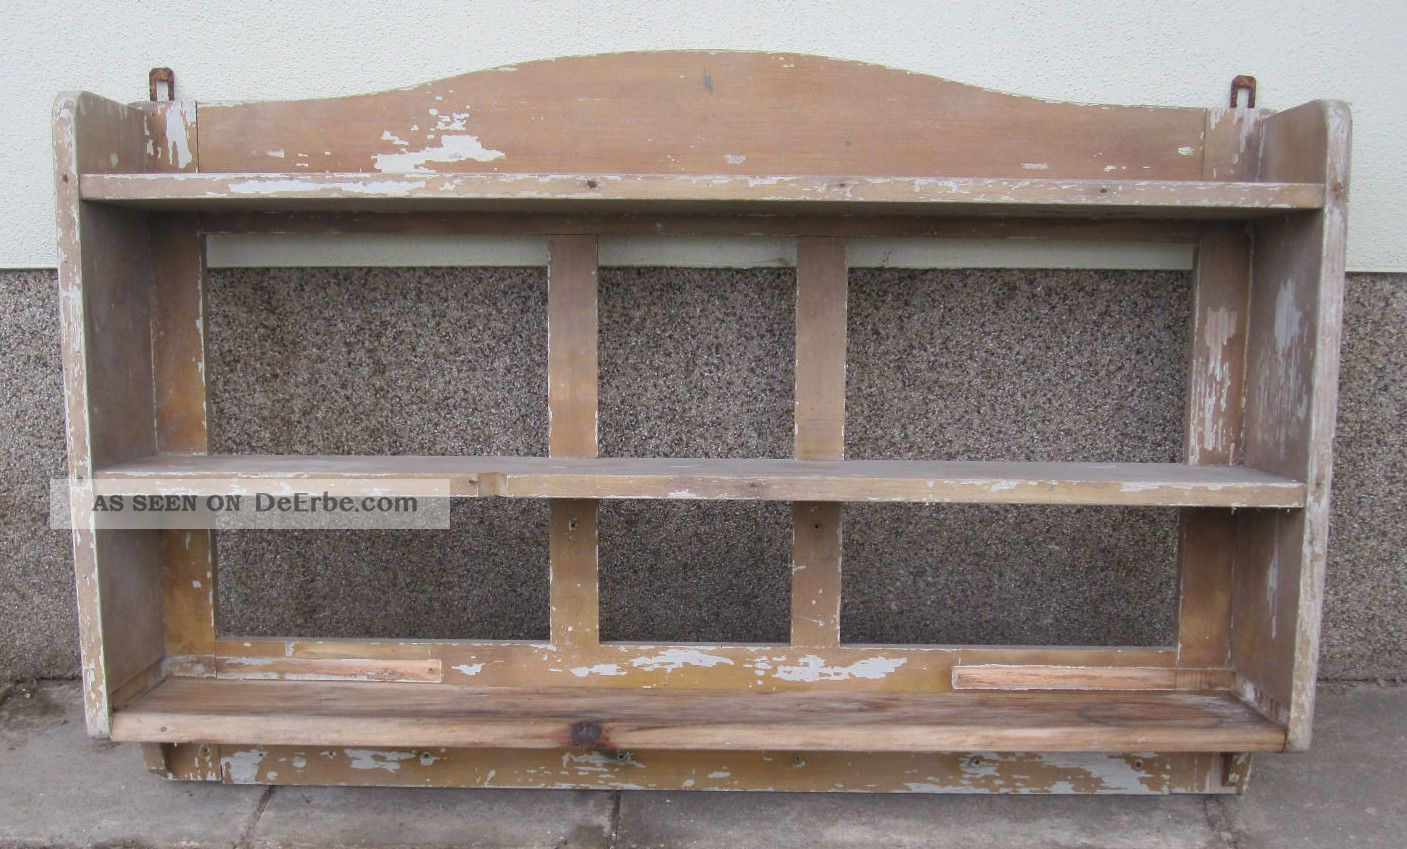 altes antikes regal holzregal wandregal h ngeregal handtuchhalter aus nachlass. Black Bedroom Furniture Sets. Home Design Ideas